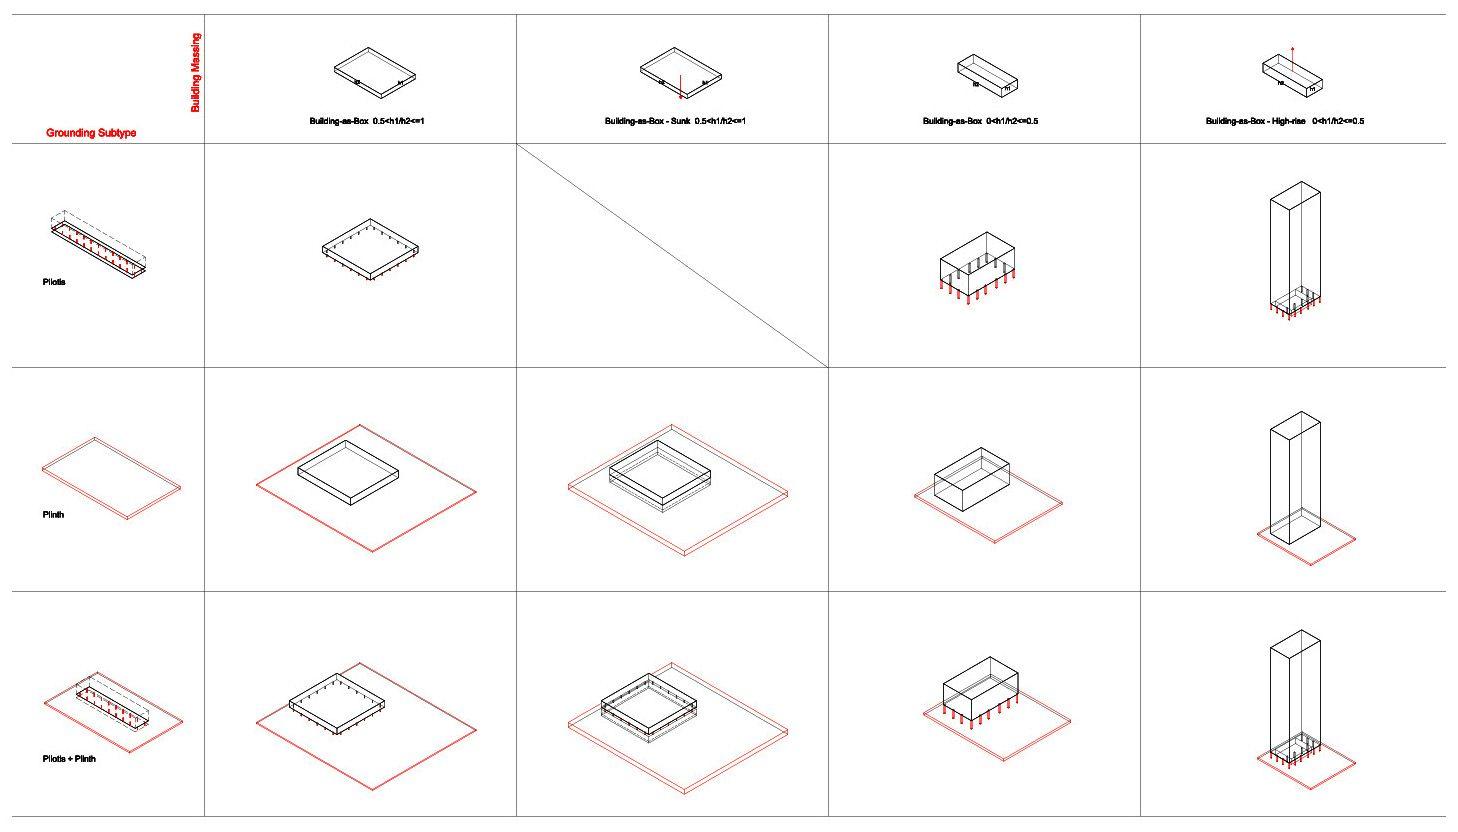 Matrix Typological Transformation Subtypes Of Pavilion